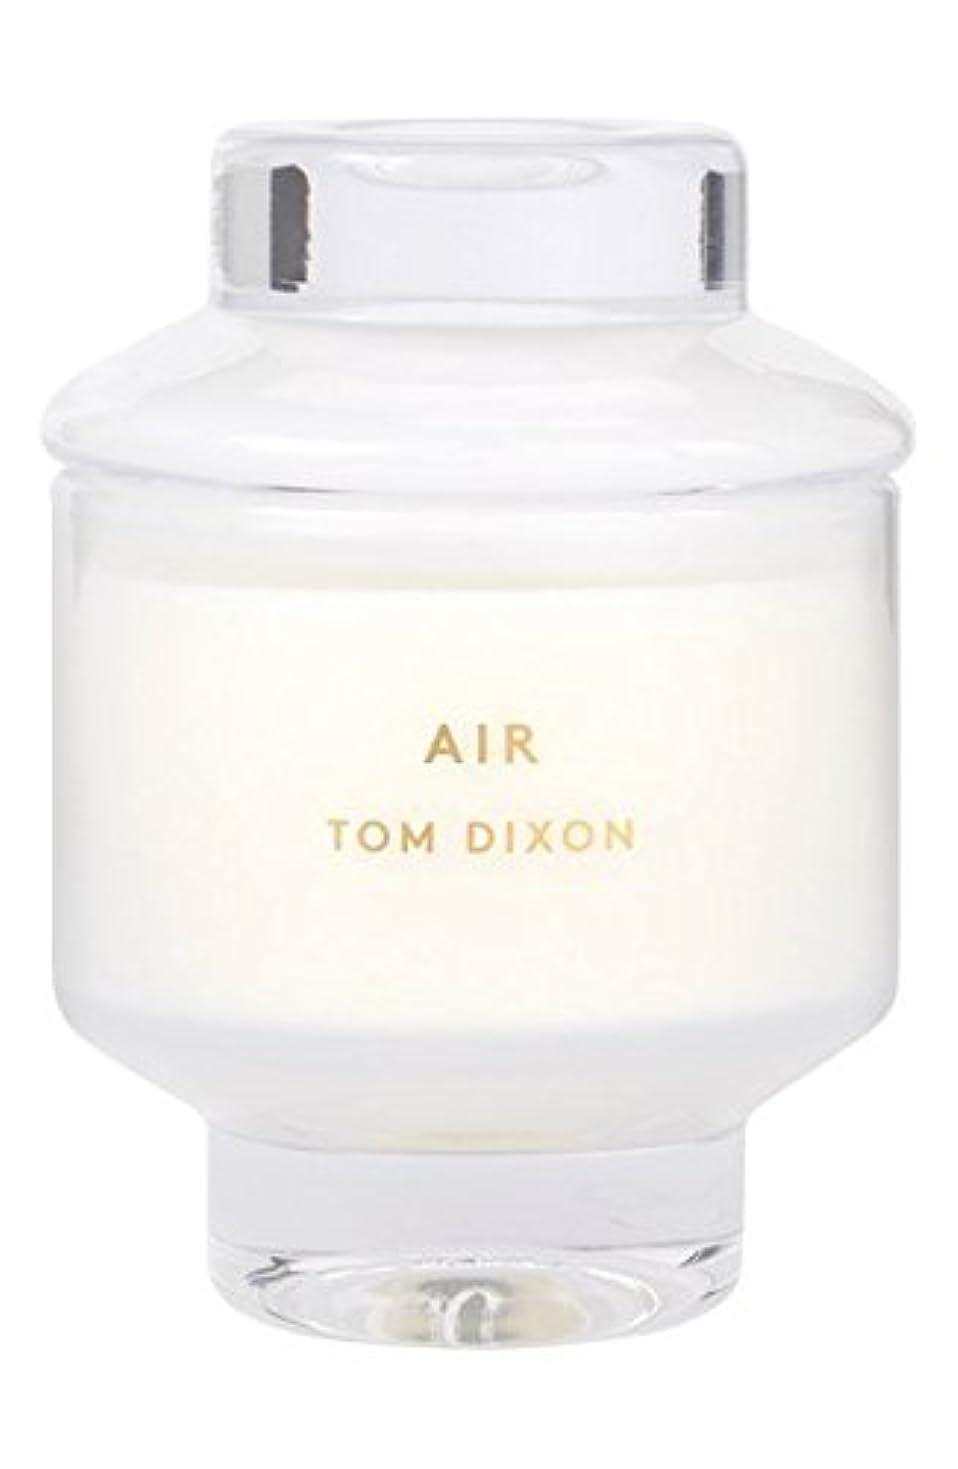 Tom Dixon 'Air' Candle (トム ディクソン 'エアー' キャンドル小)Small